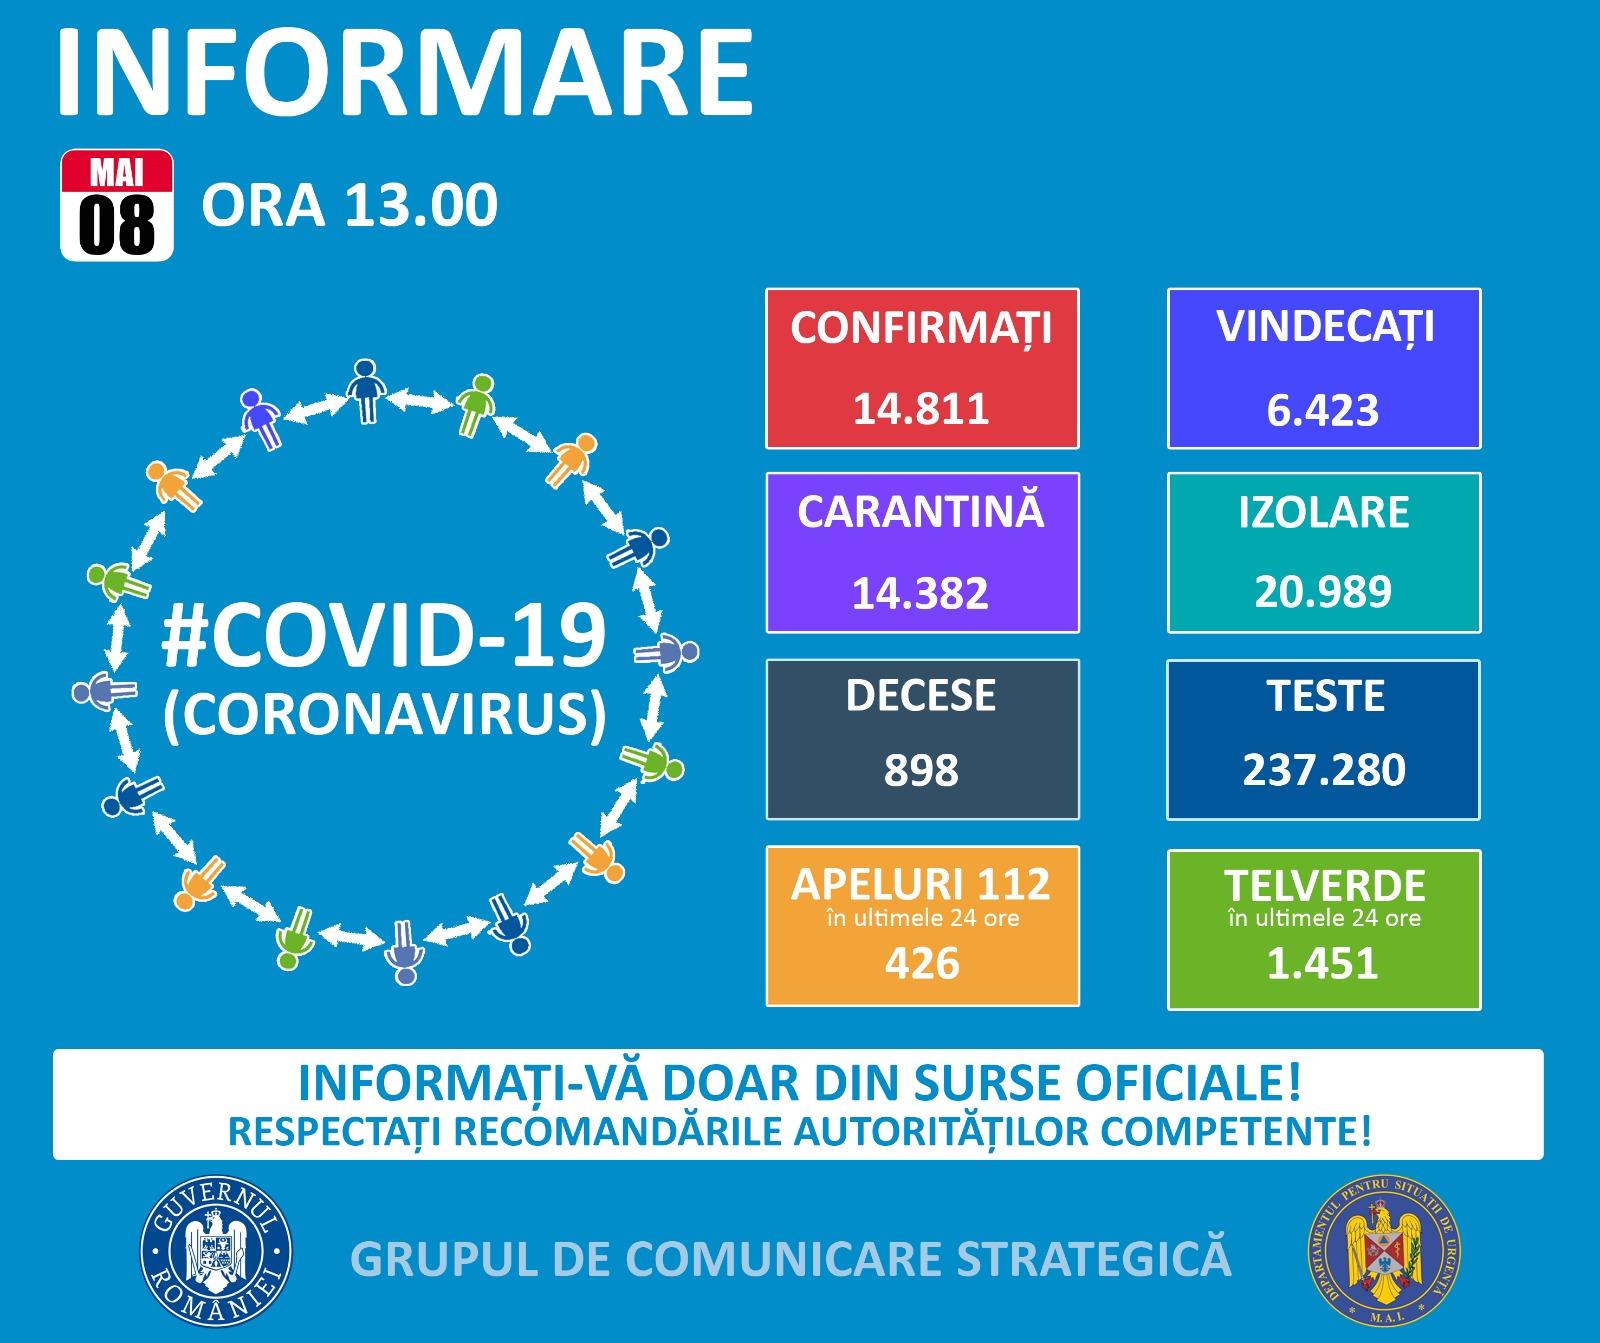 COVID-19 Romania situatie 8 mai 2020